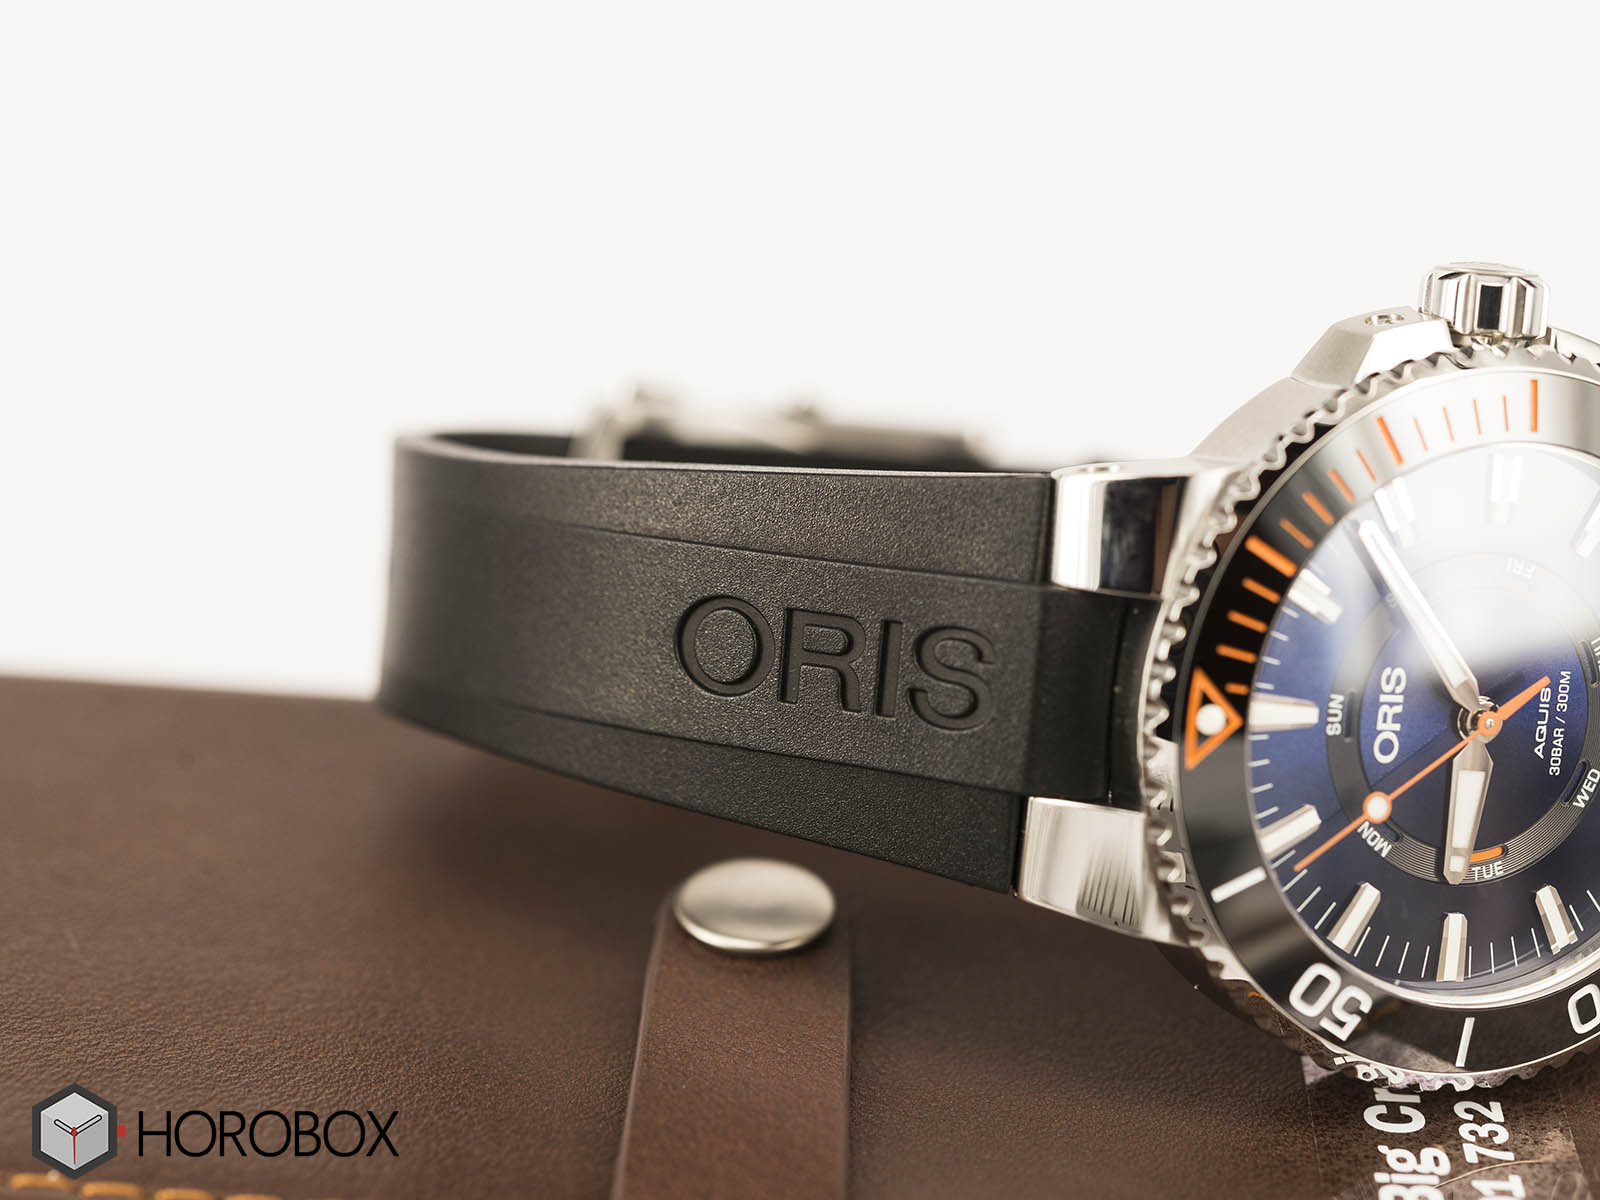 Oris-Staghorn-Restoration-Limited-Edtion-9.jpg